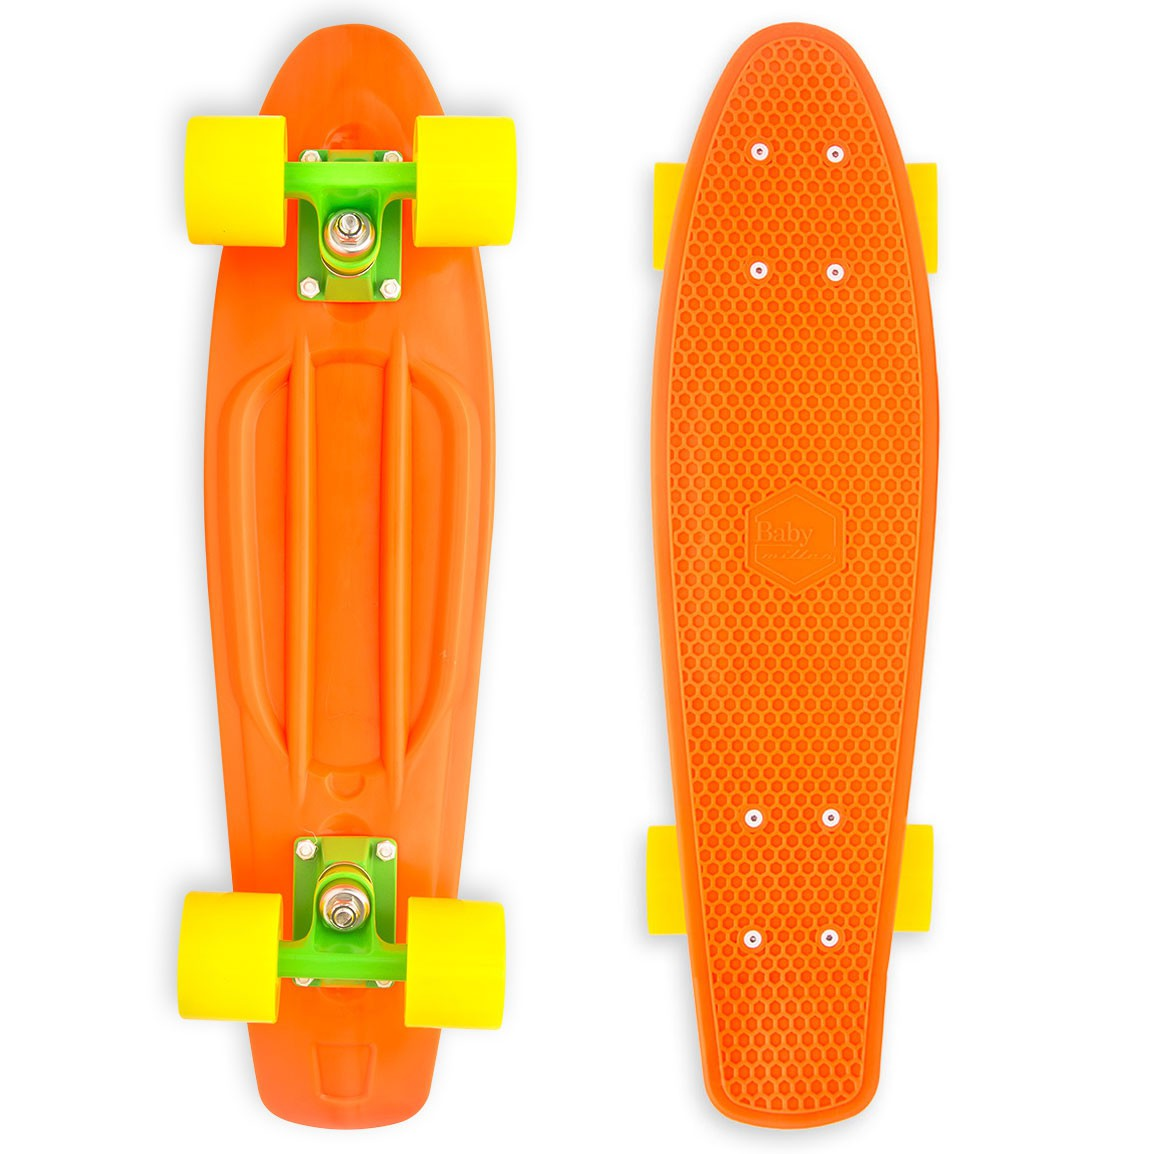 Baby Miller Orange skateboard